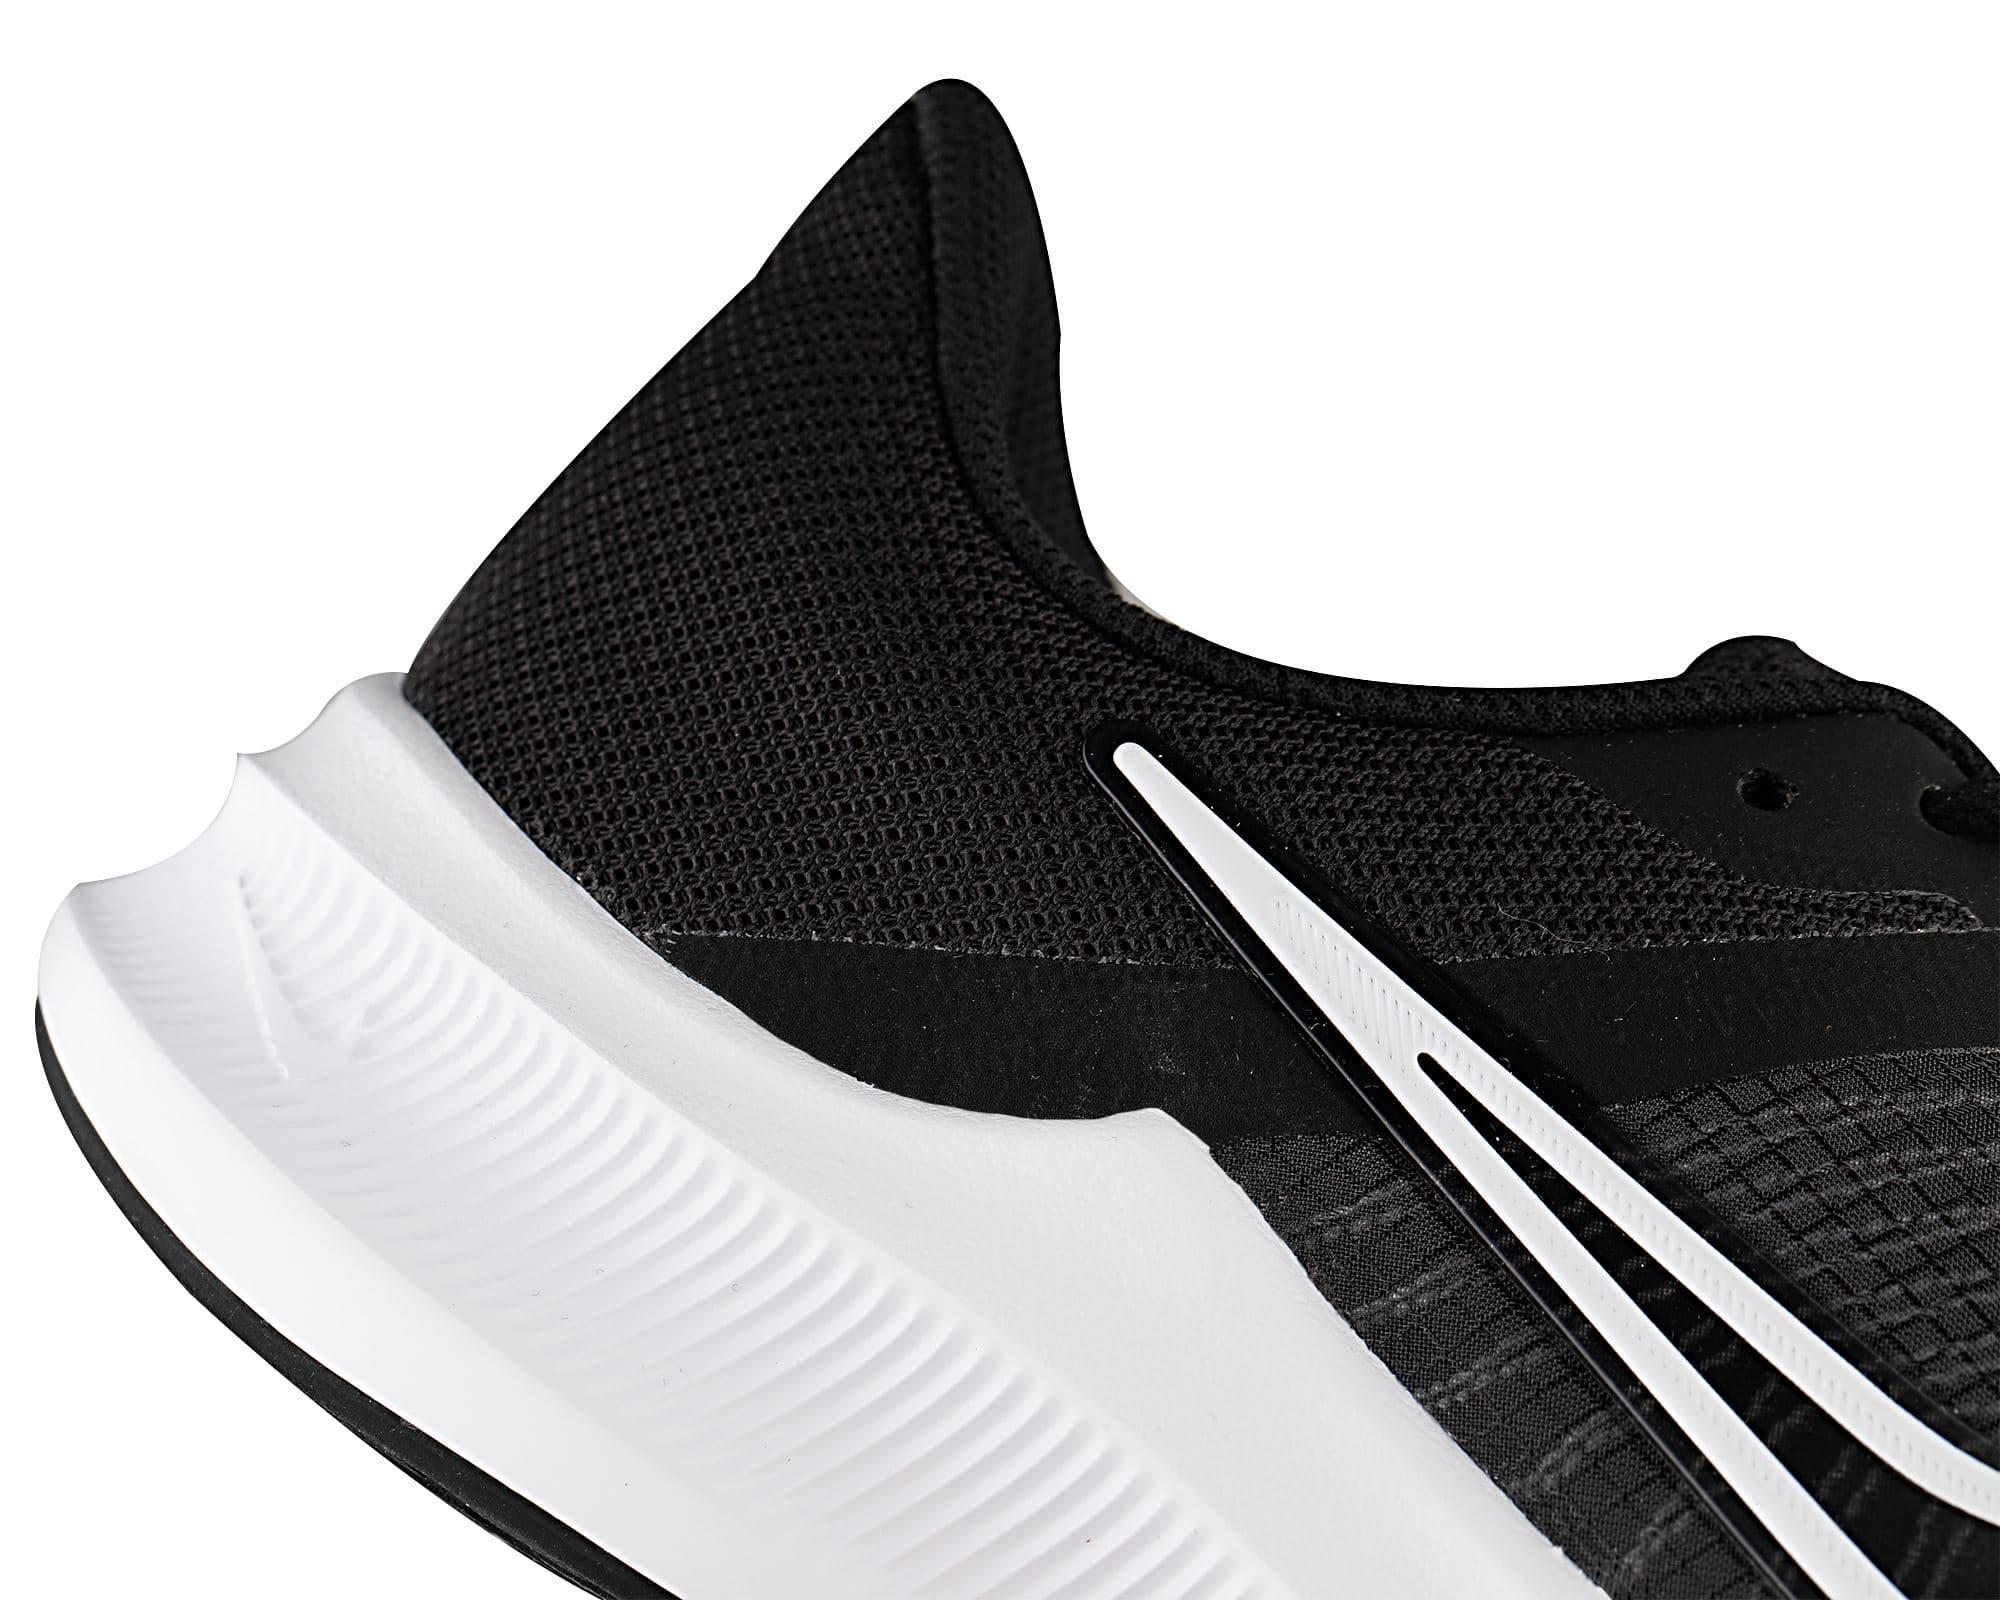 Downshifter 11 Erkek Siyah Koşu Ayakkabısı (CW3411-006)